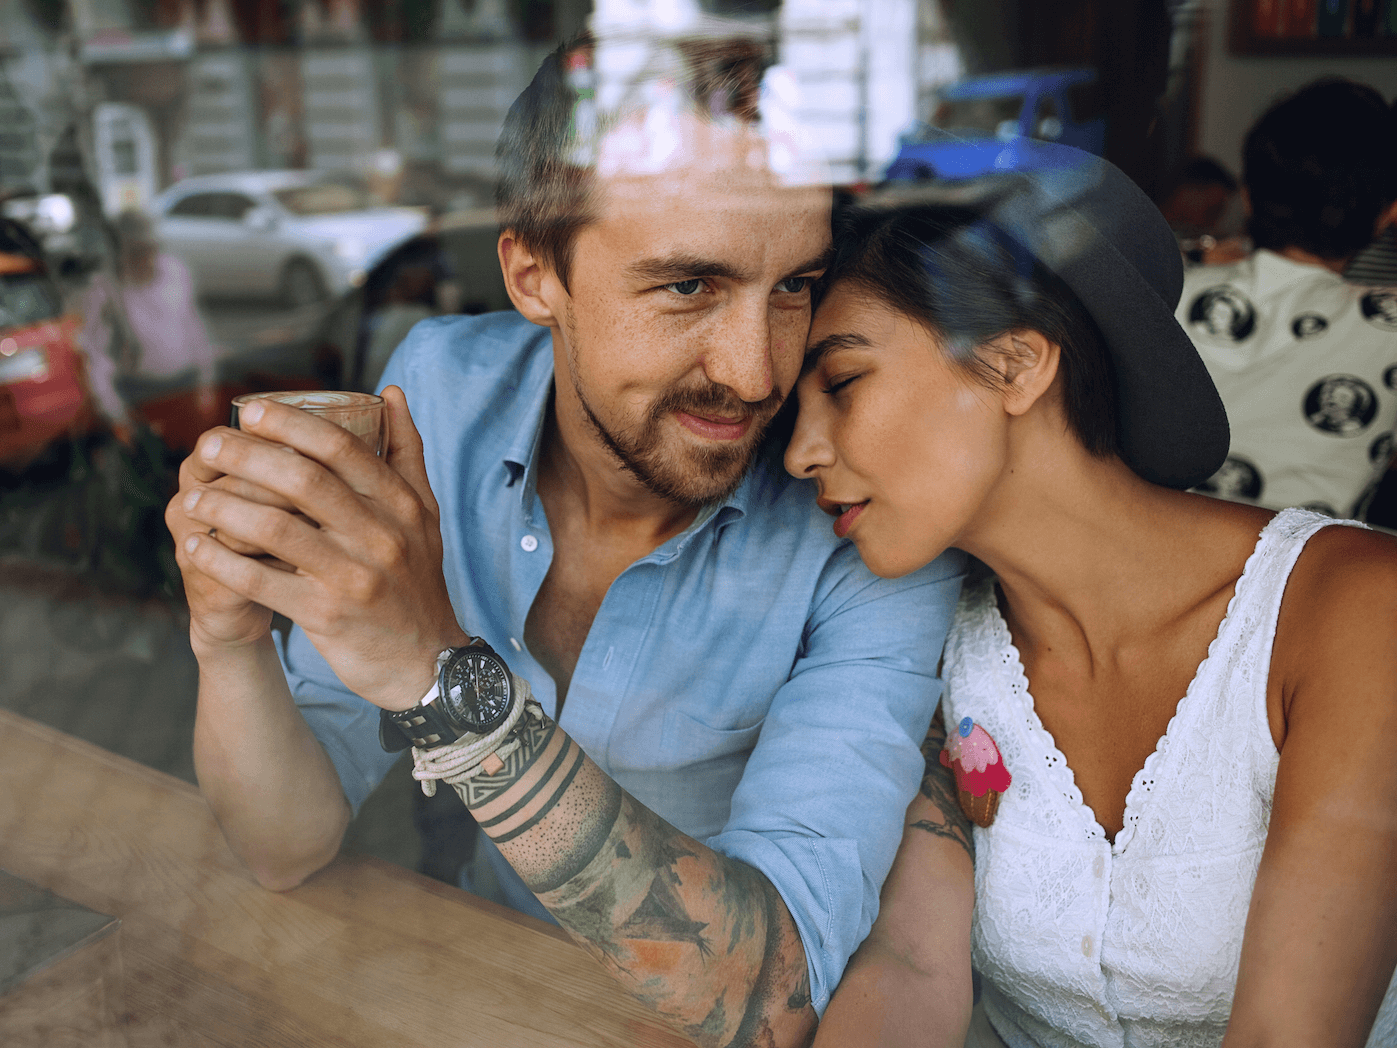 bufalo gratis dating online